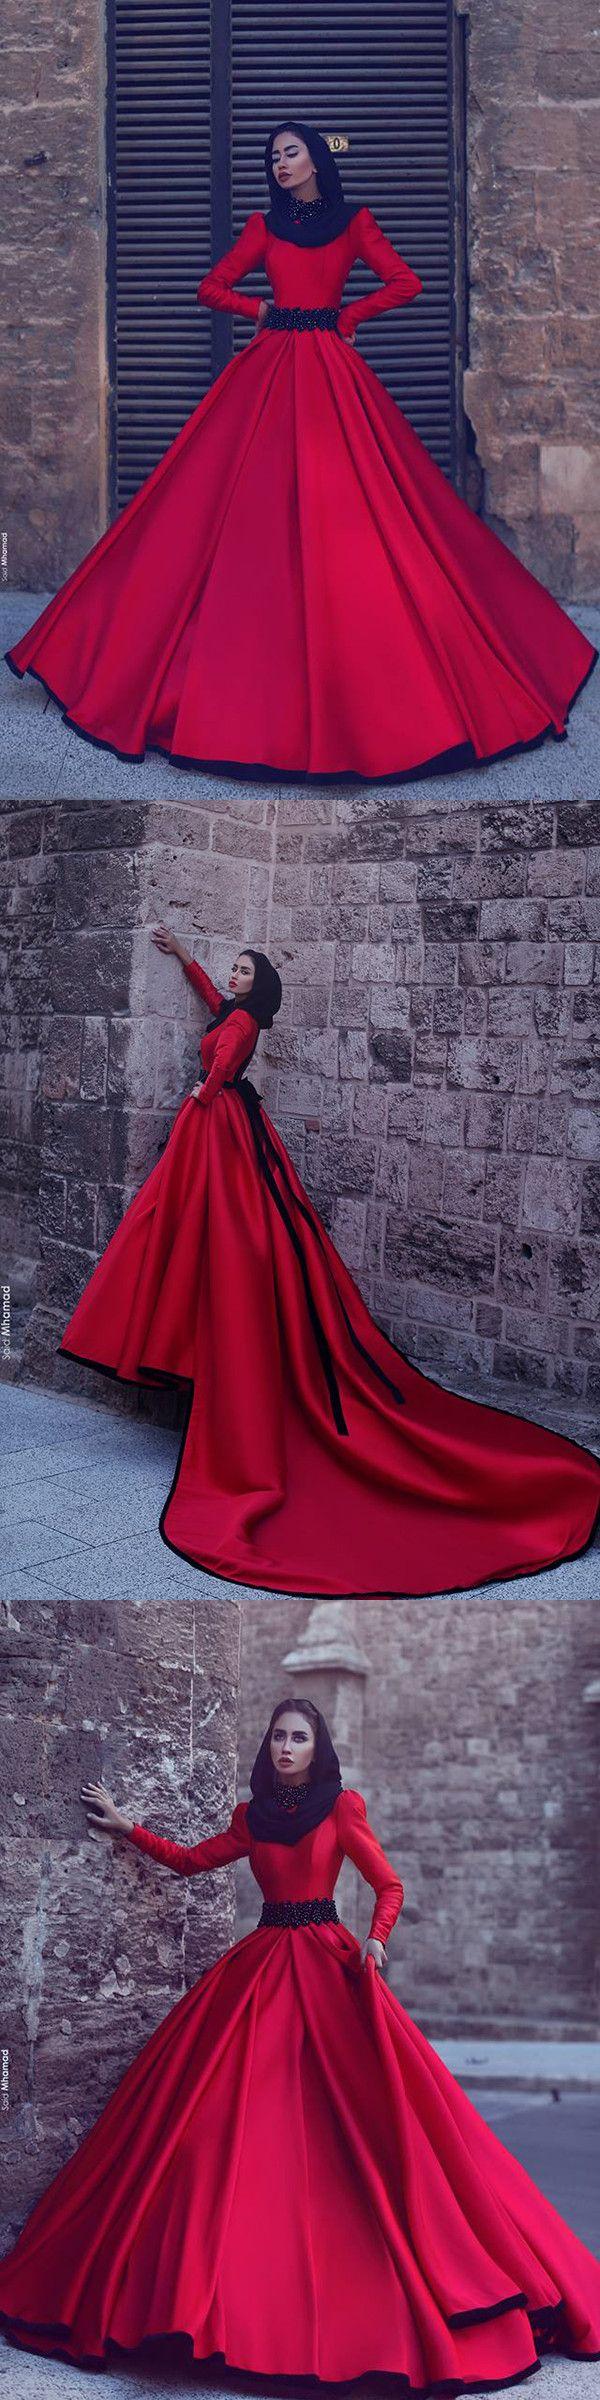 red vintage wedding dress long sleeve cheap wedding dress